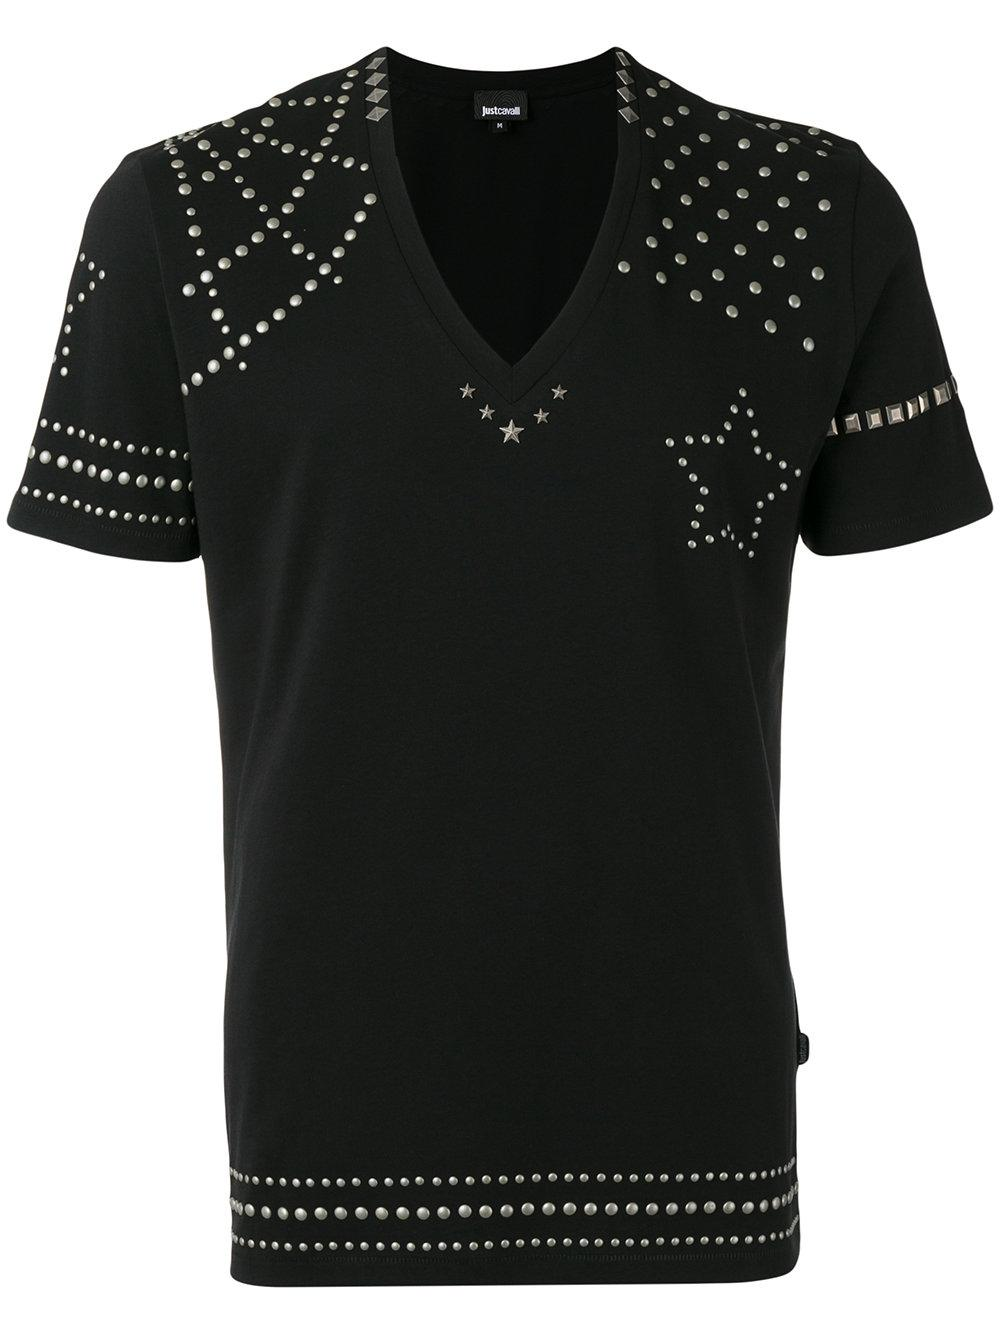 Just Cavalli Metallic Stud T Shirt In Black For Men Lyst